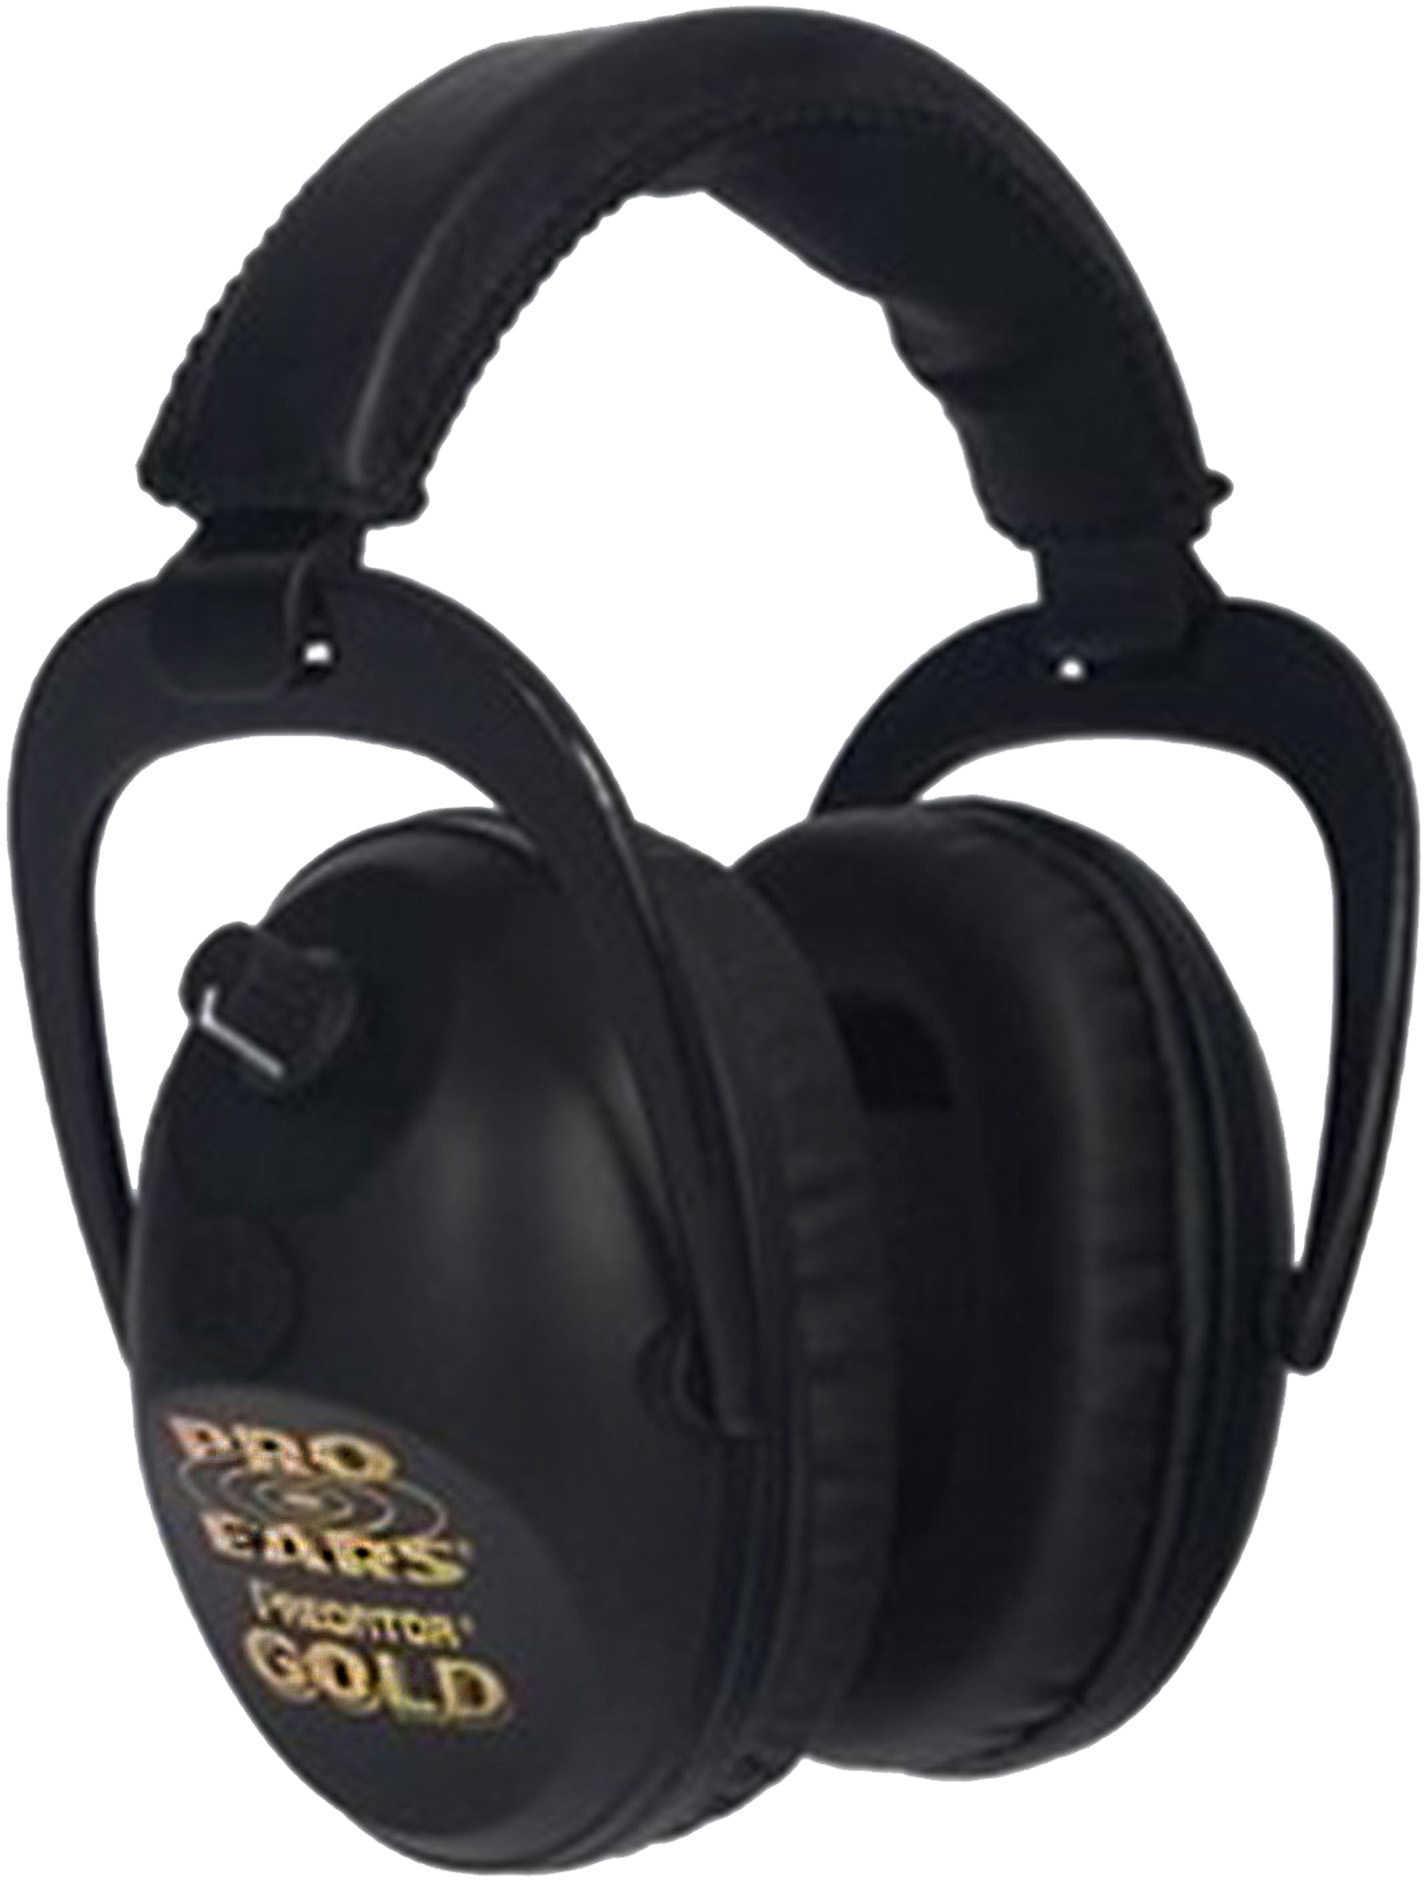 Gold Series Predator, NRR 26, Black Md: Gs-P300-Black